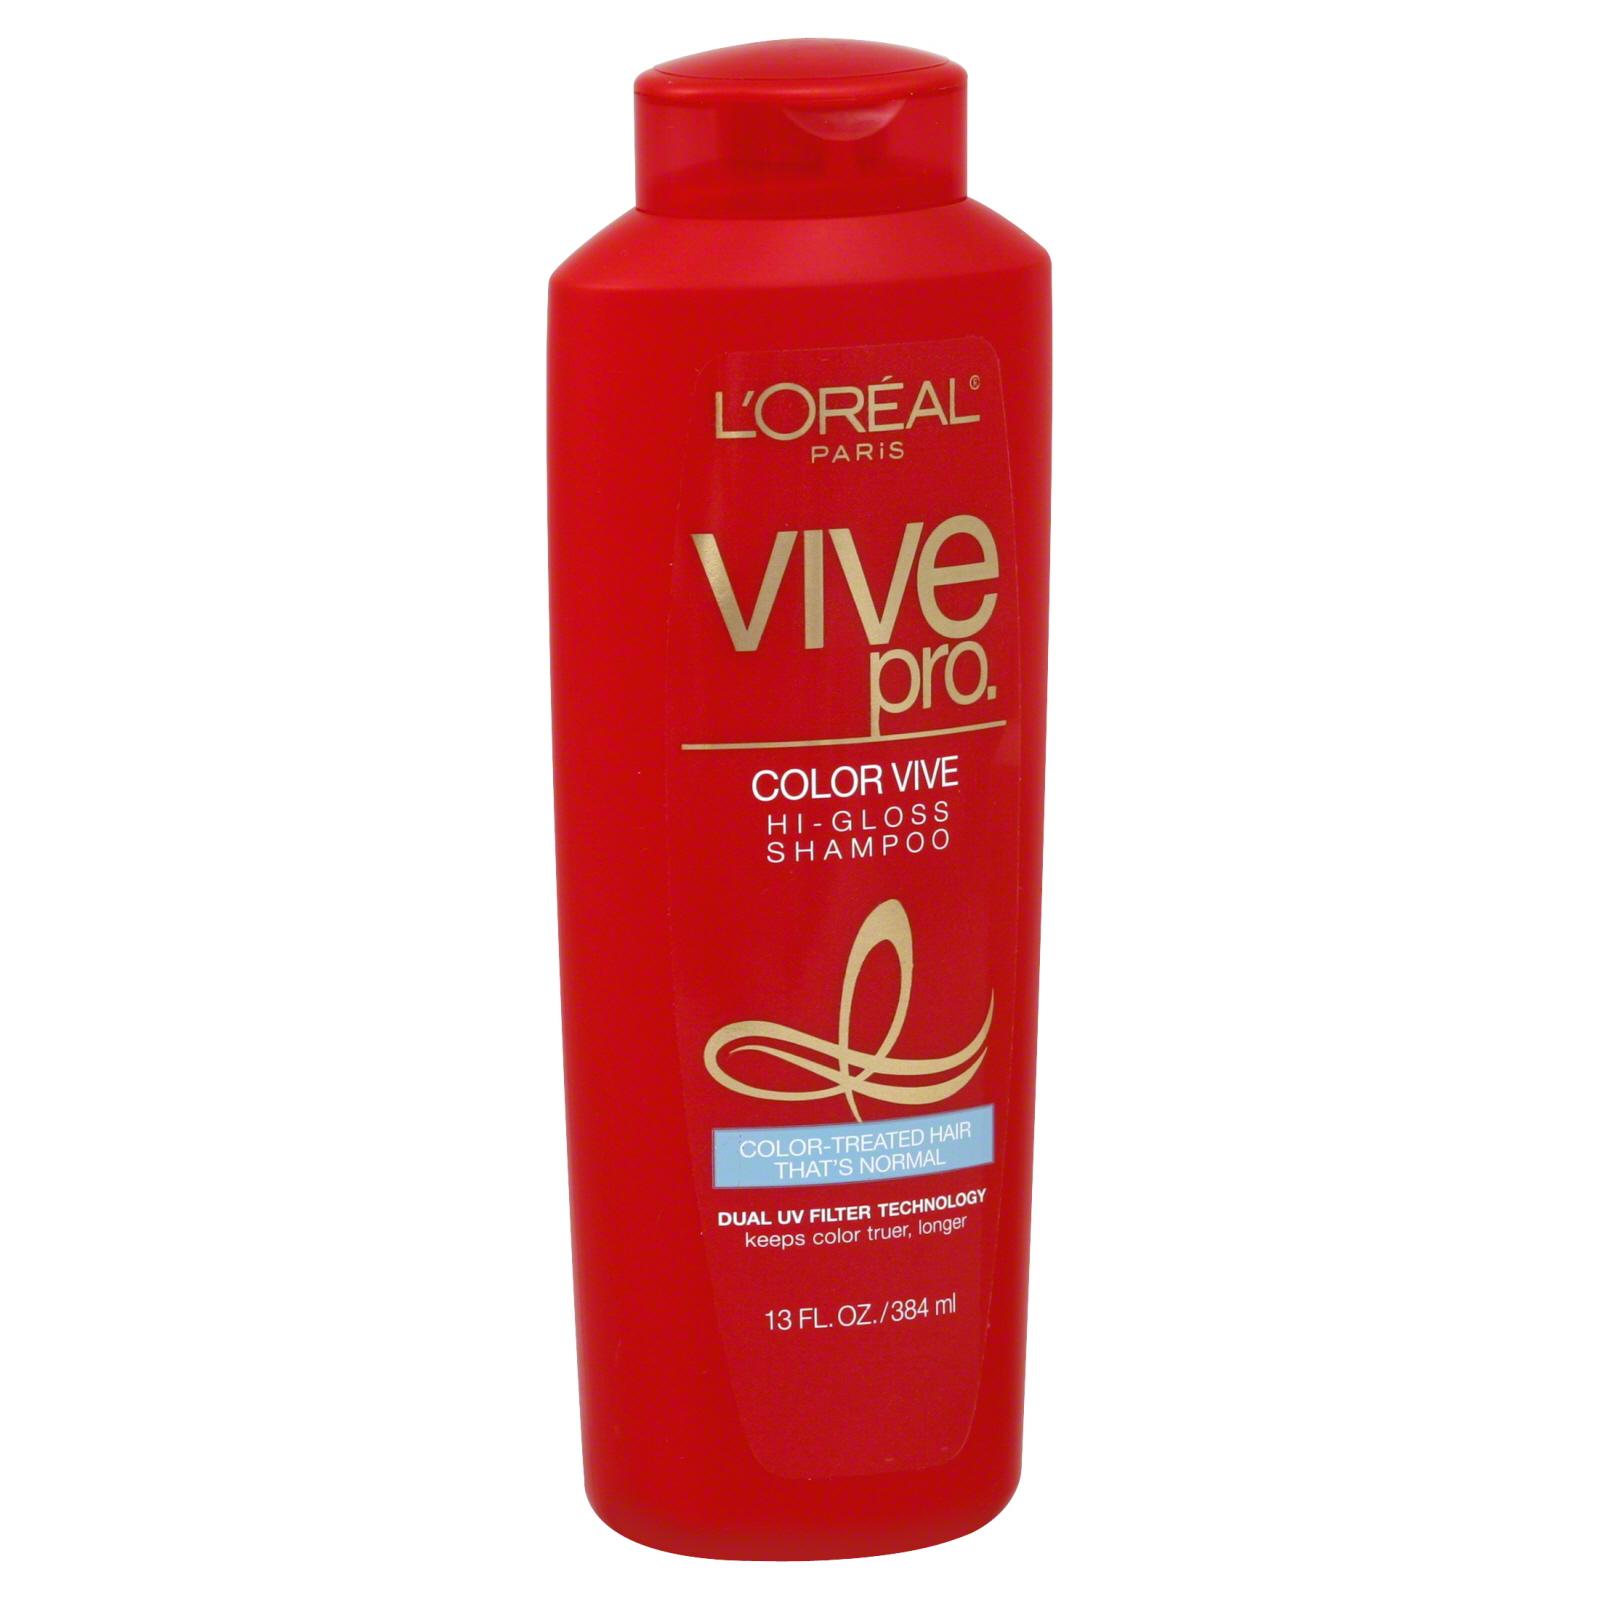 L'Oreal Color Vive Shampoo